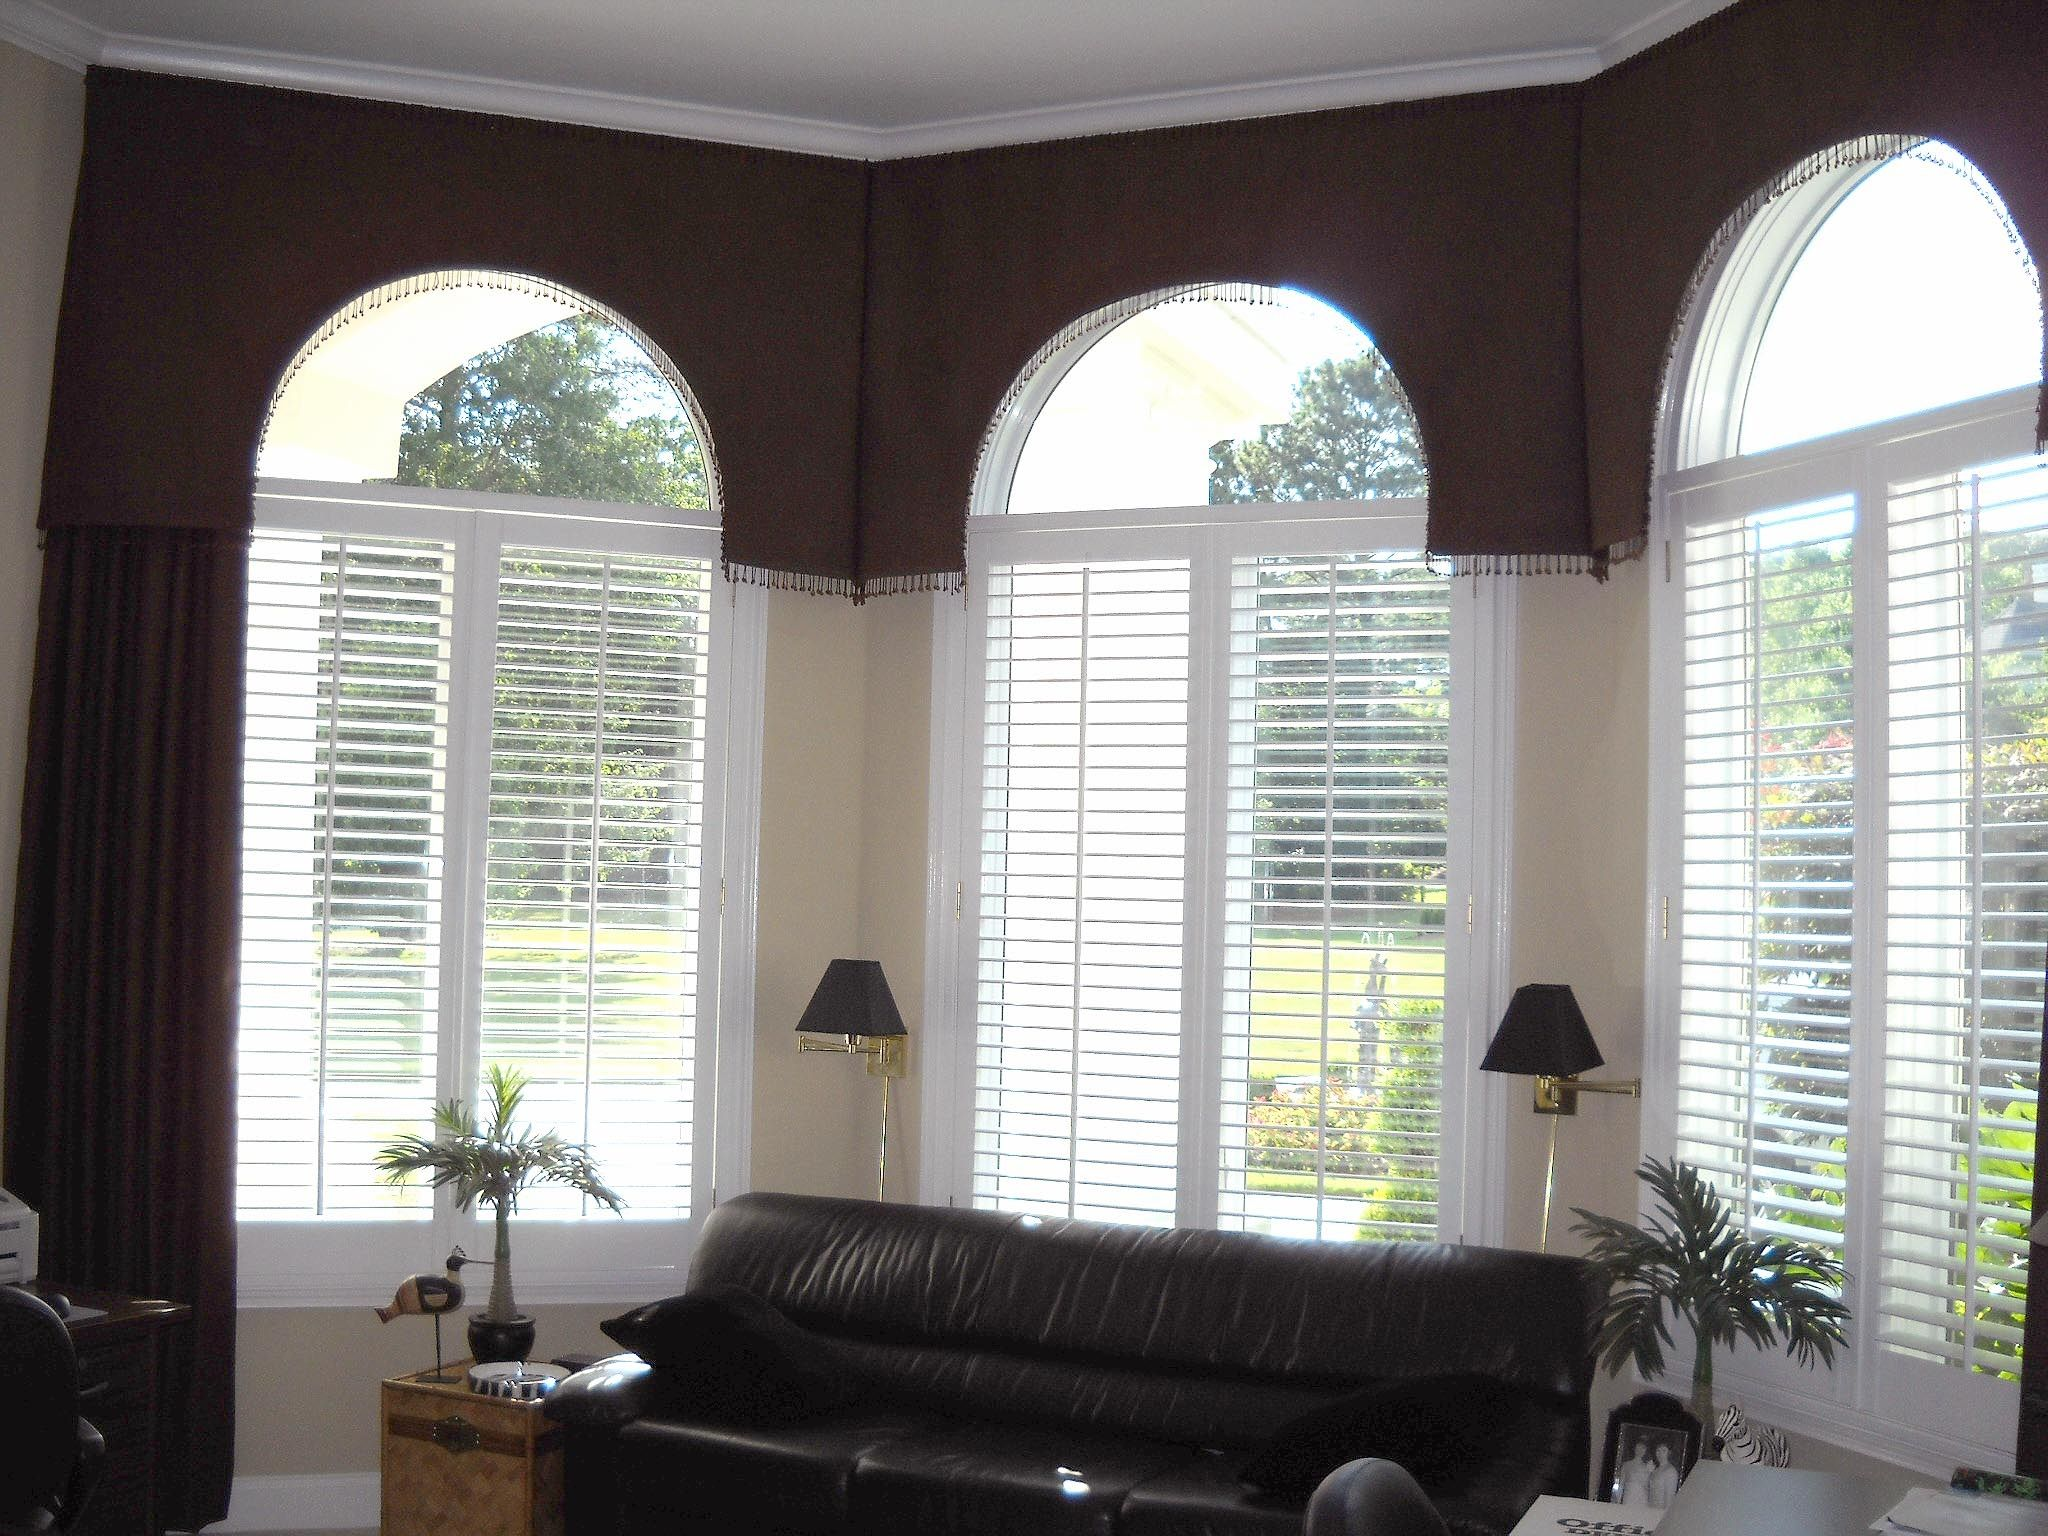 Window Treatments Soft Cornices Shaped Around Arch Windows